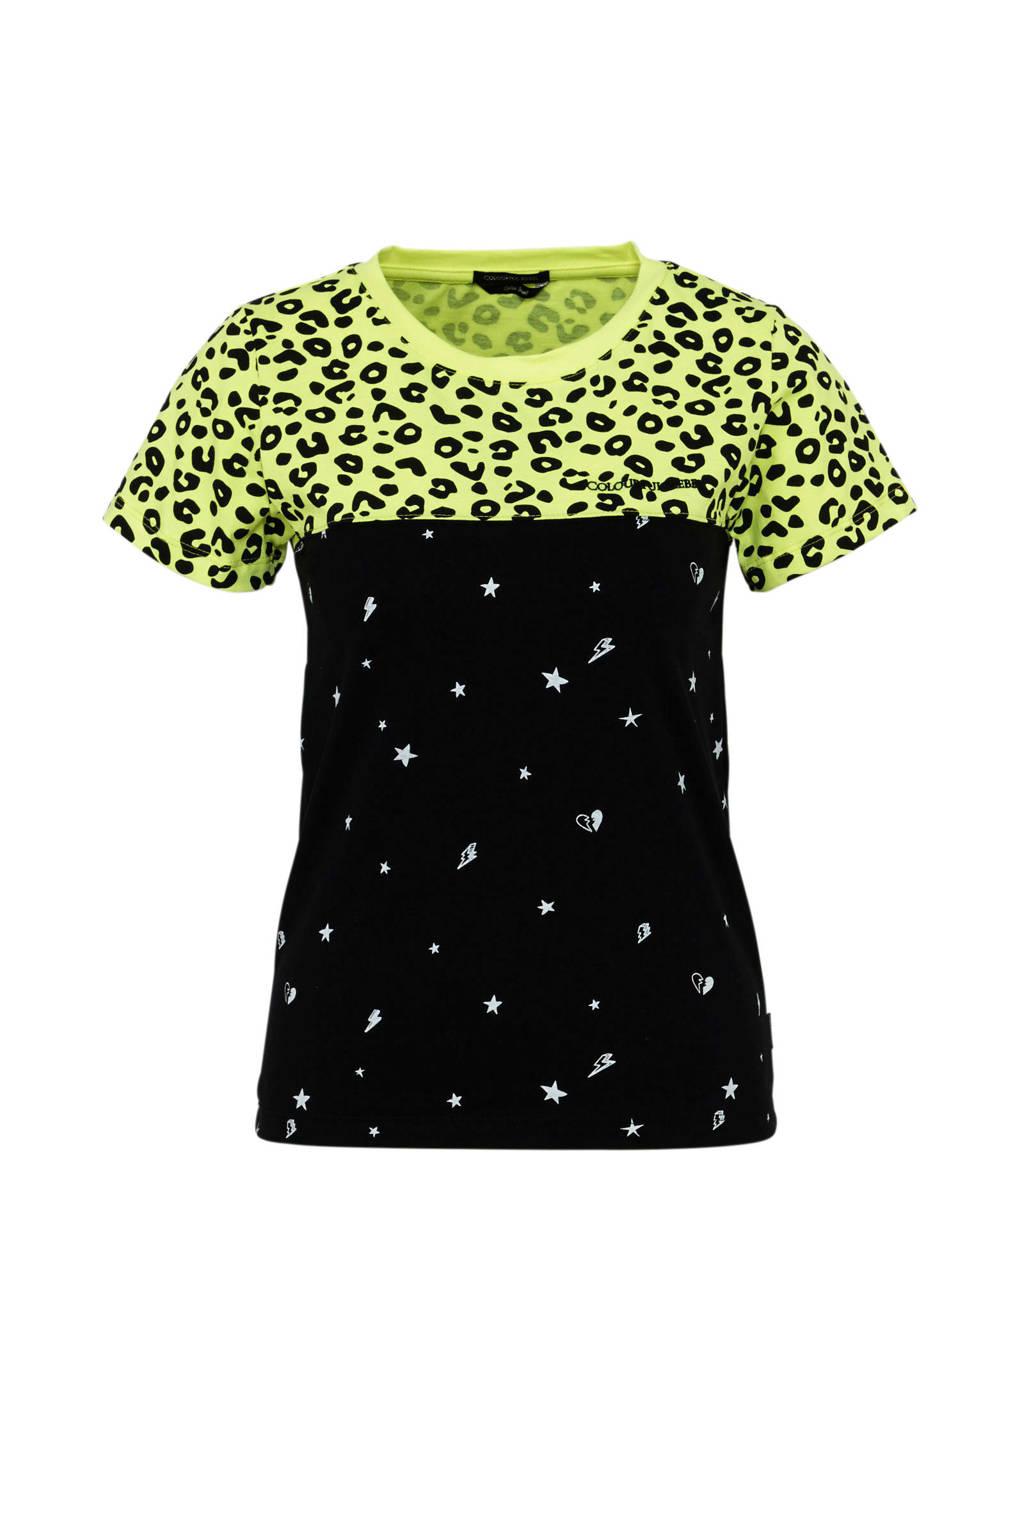 Colourful Rebel T-shirt met all over print zwart/groen/wit, Zwart/groen/wit